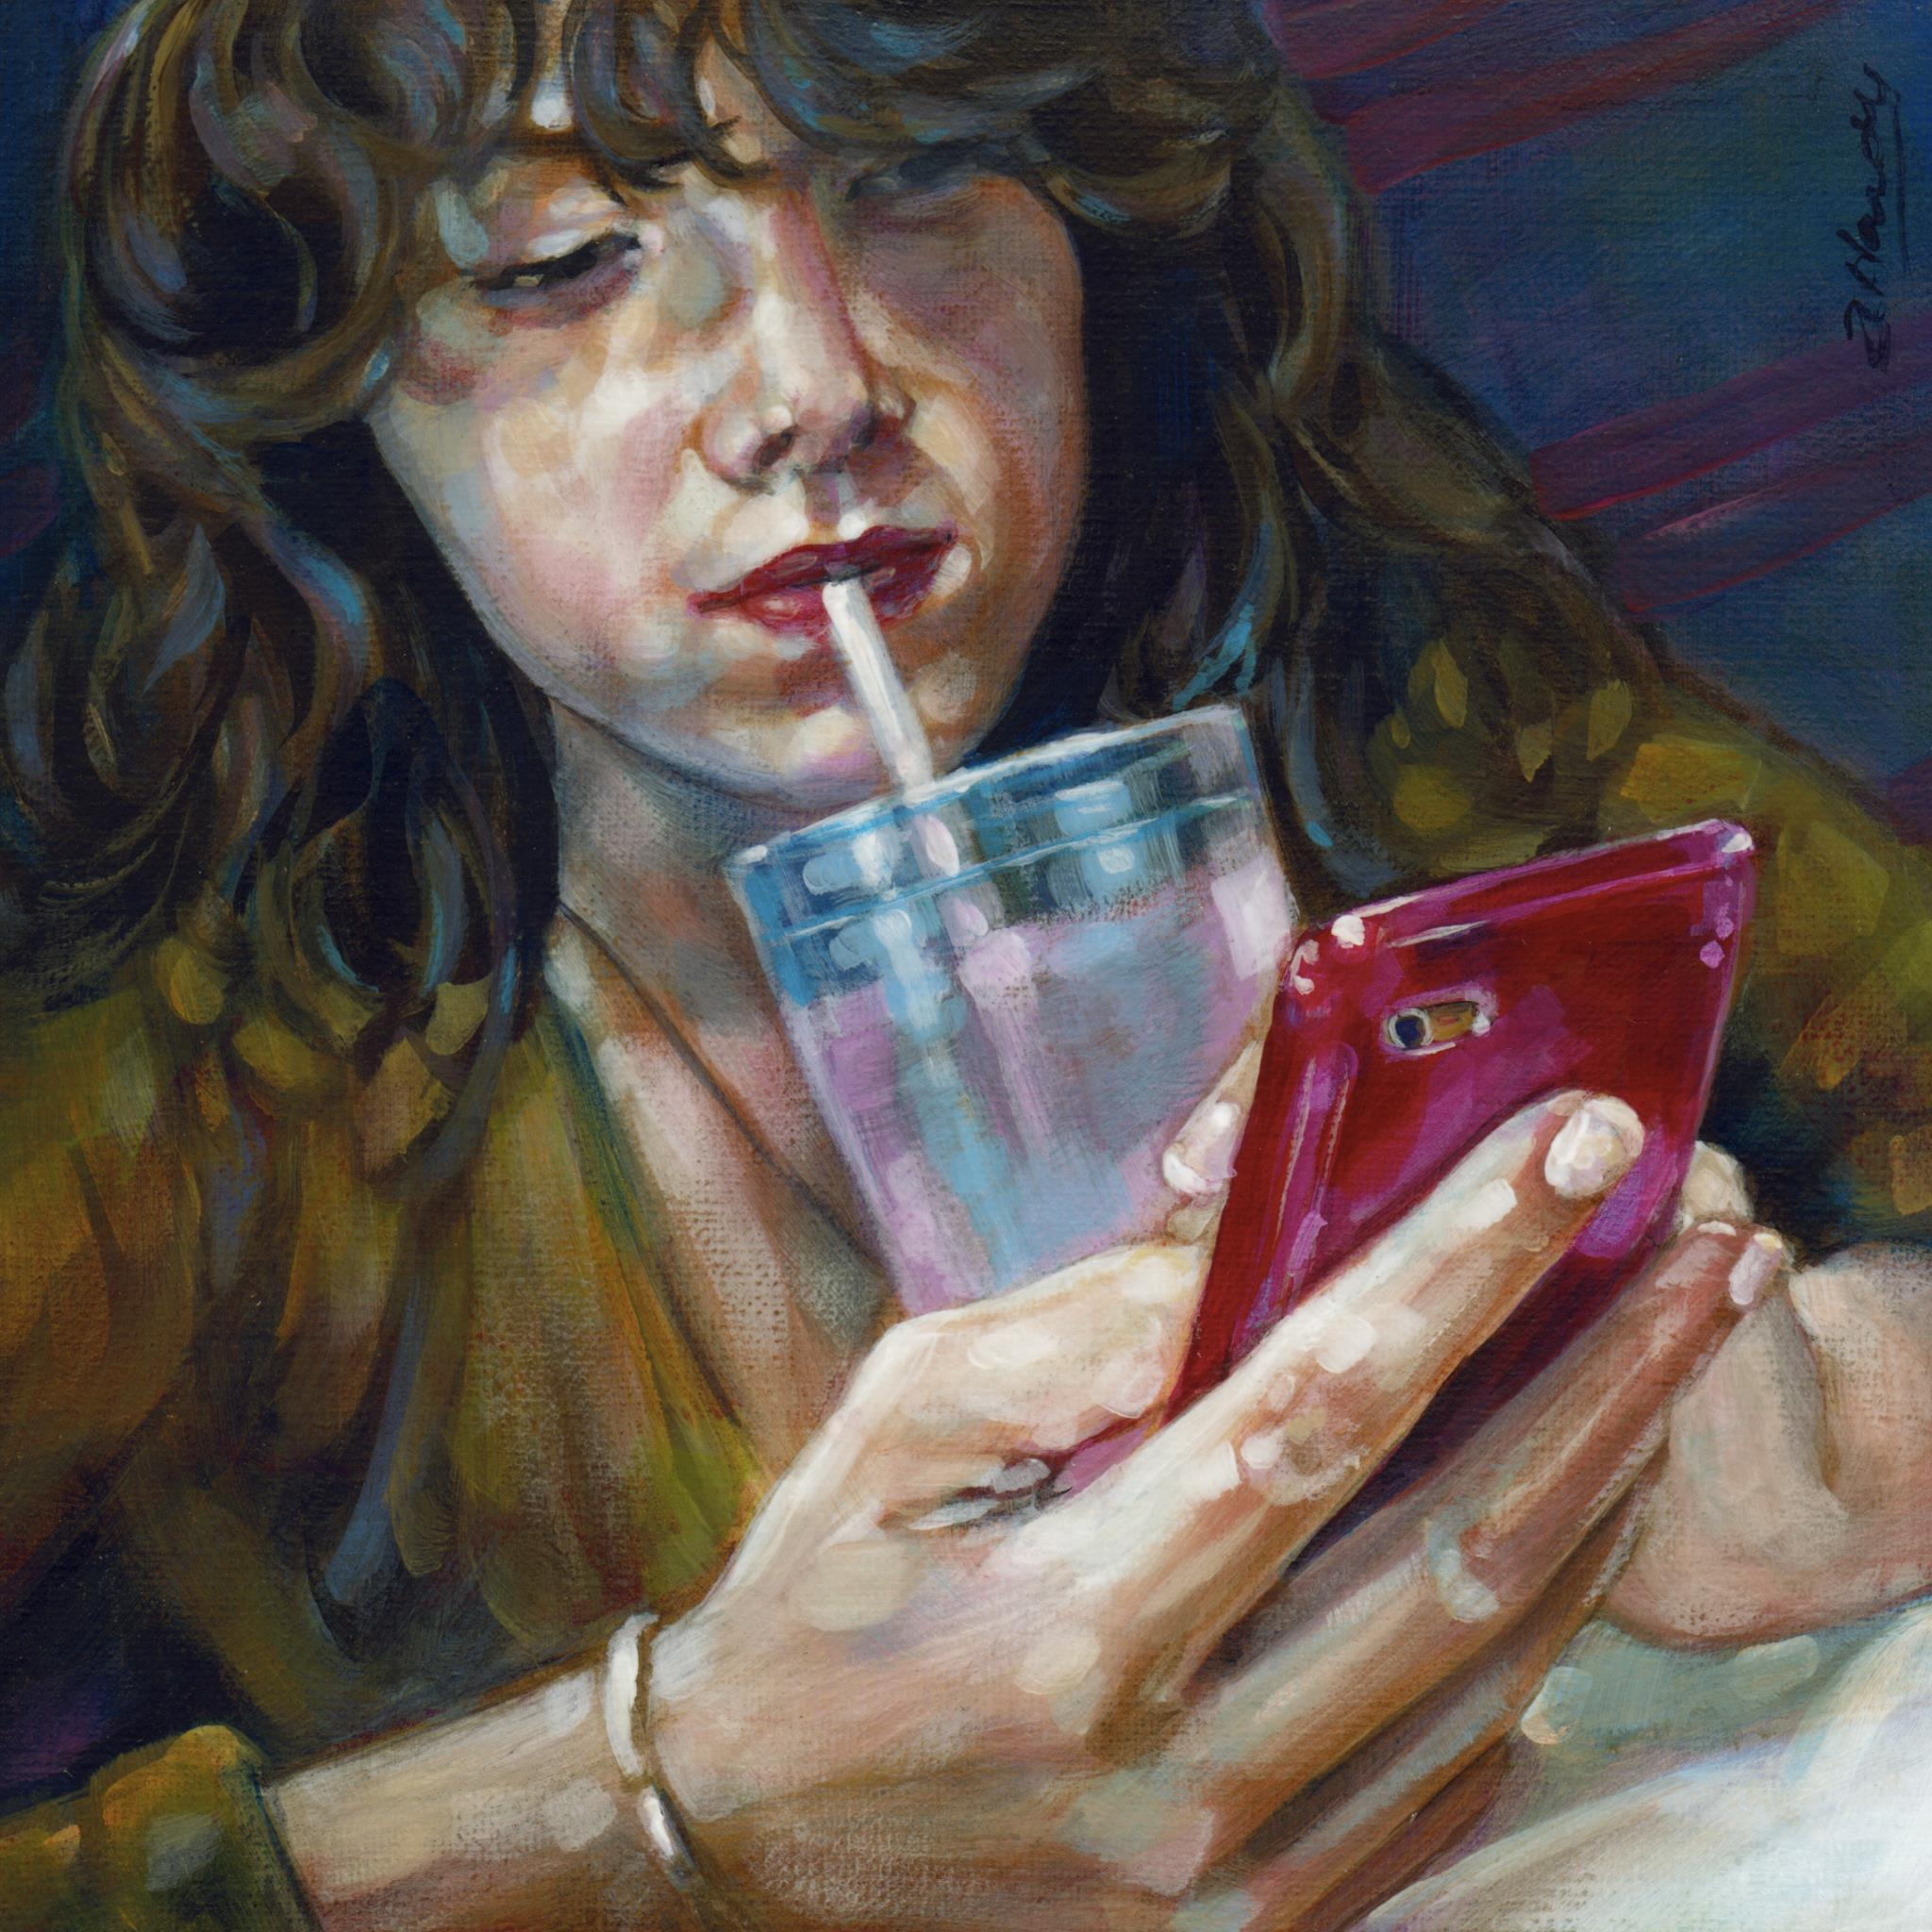 """At Arms Length#38, 2BZ4UQT"" original fine art by Angela Hardy"